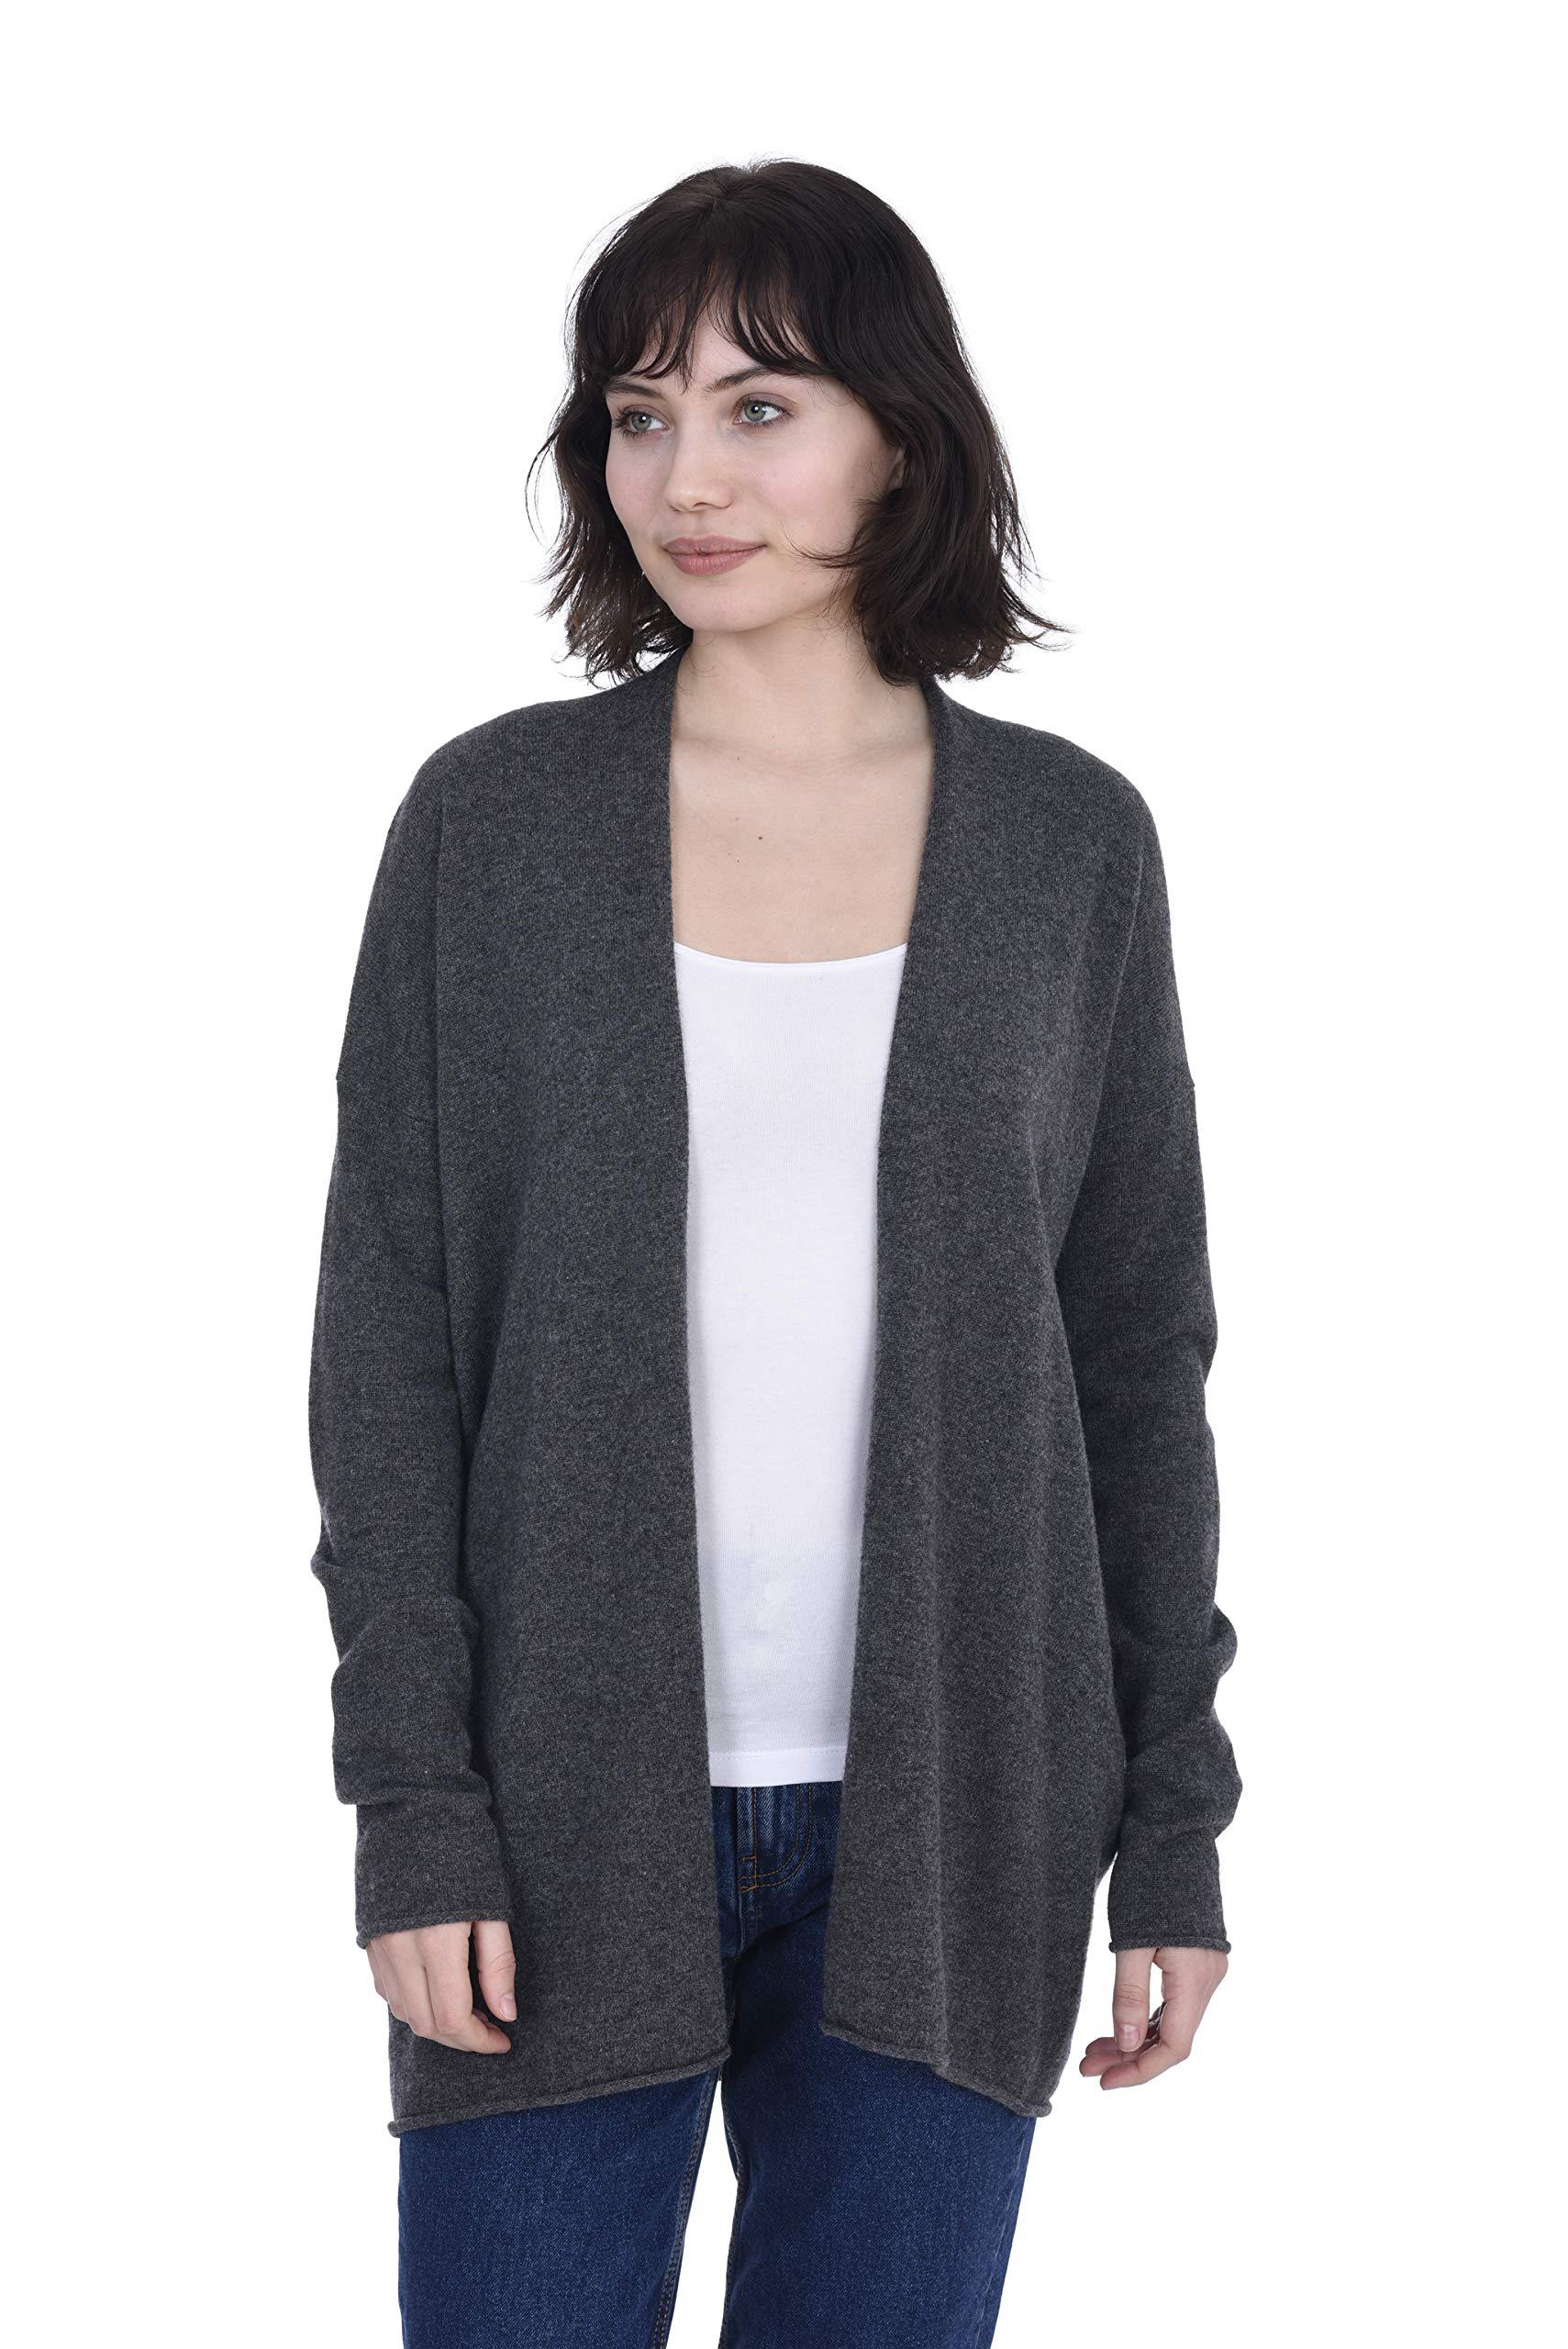 Cashmeren Lightweight Open Front Cardigan 100% Pure Cashmere Long Sleeve Sweater for Women